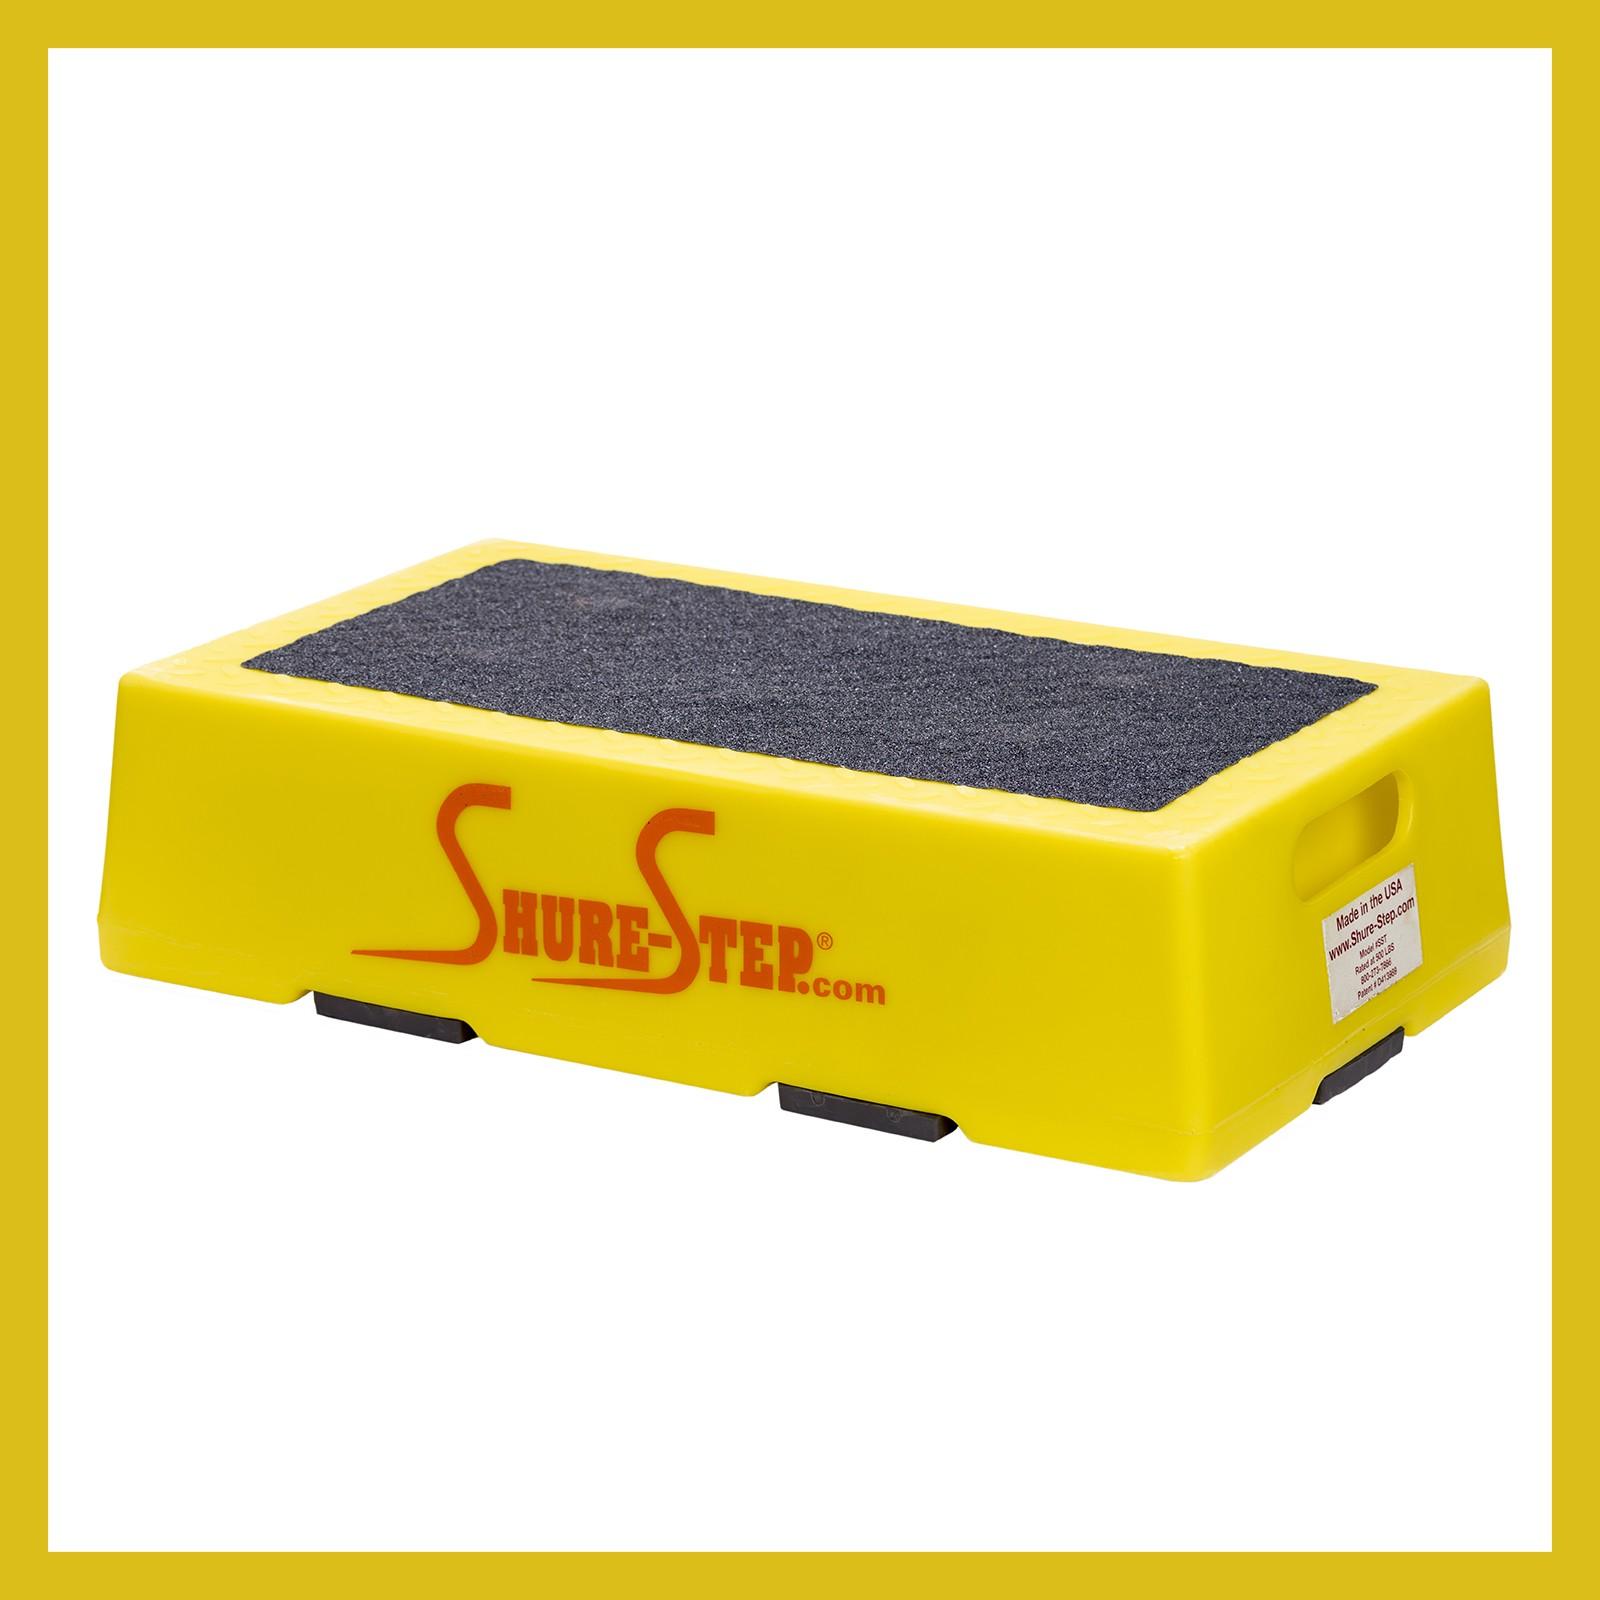 Shure Step Senior Step Free Shipping